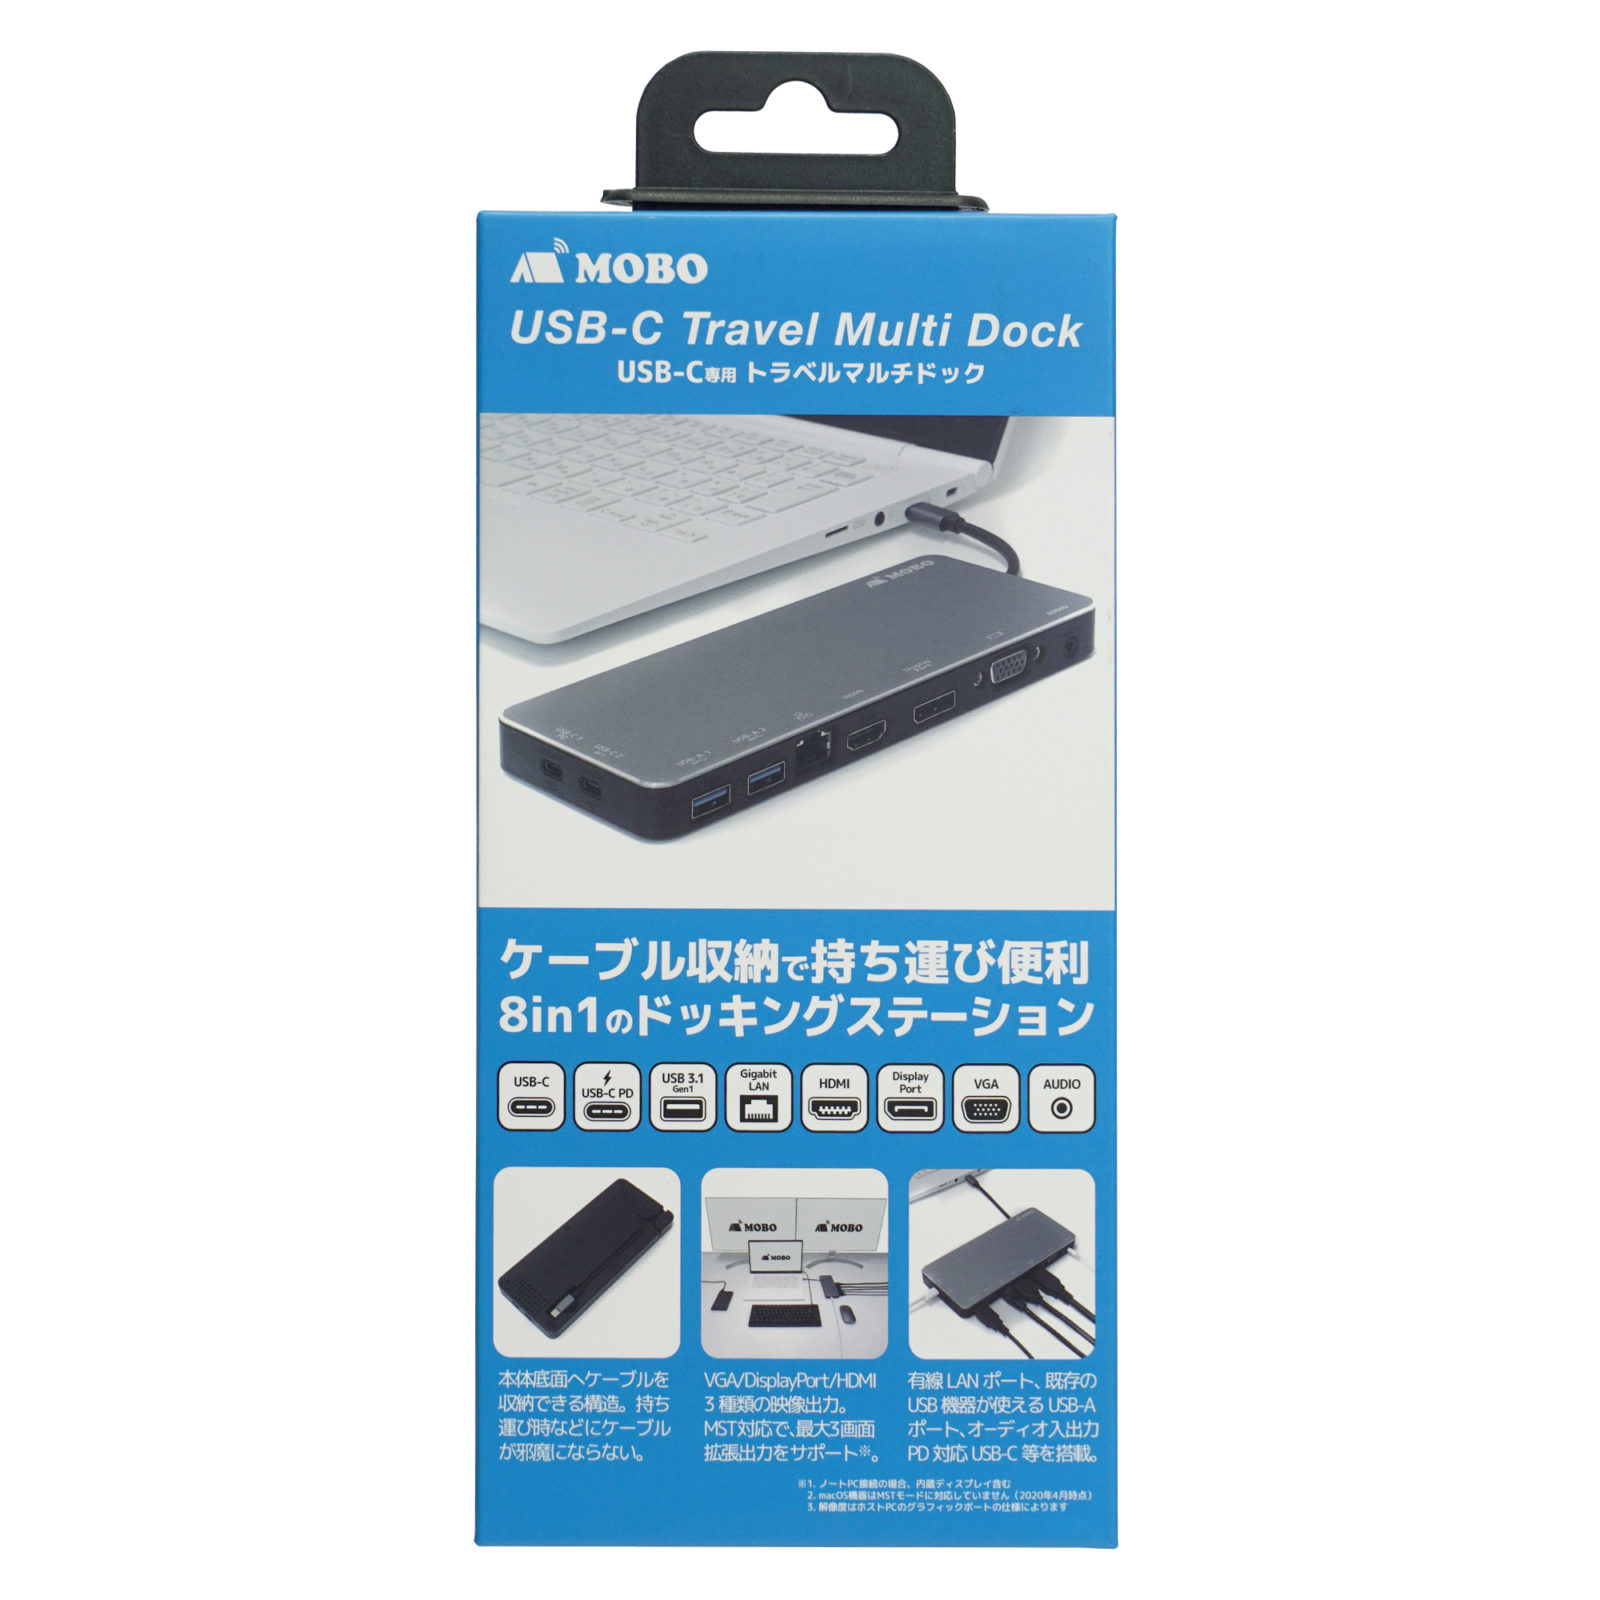 USB-C-Travel-Multi-Dock-33